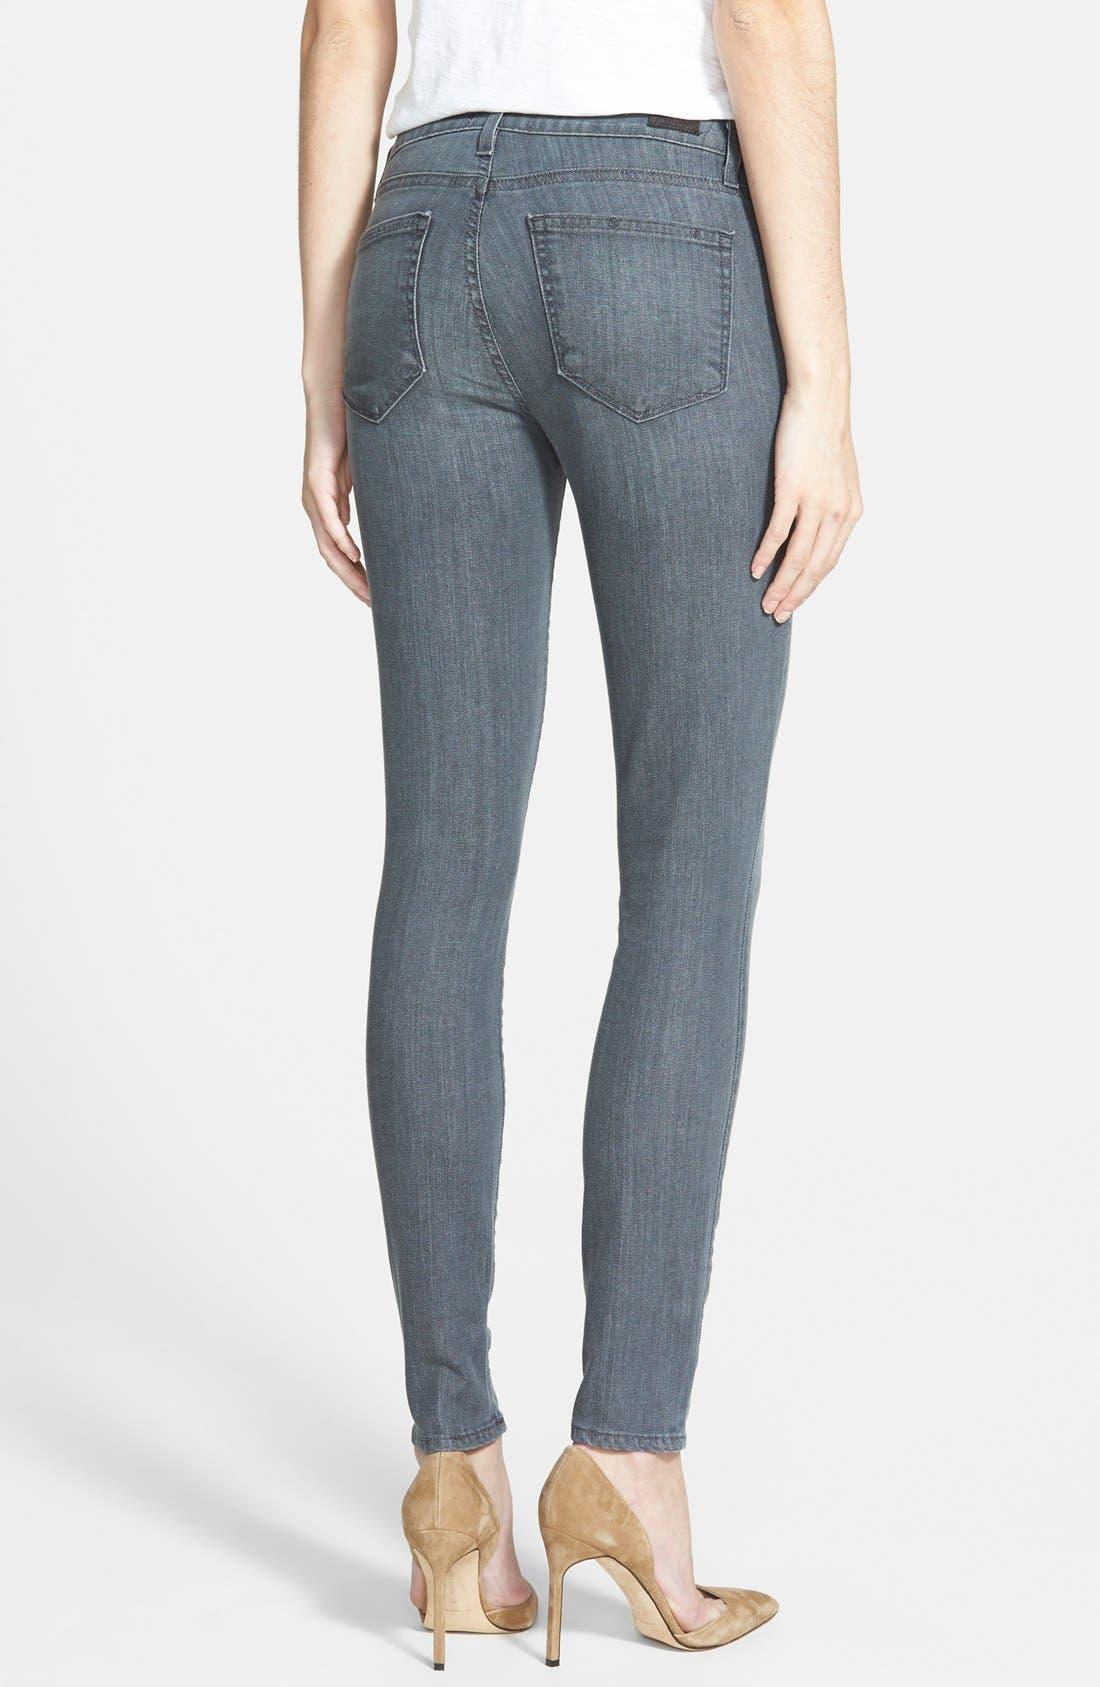 Alternate Image 2  - Paige Denim 'Verdugo' Ultra Skinny Jeans (Anderson Grey)